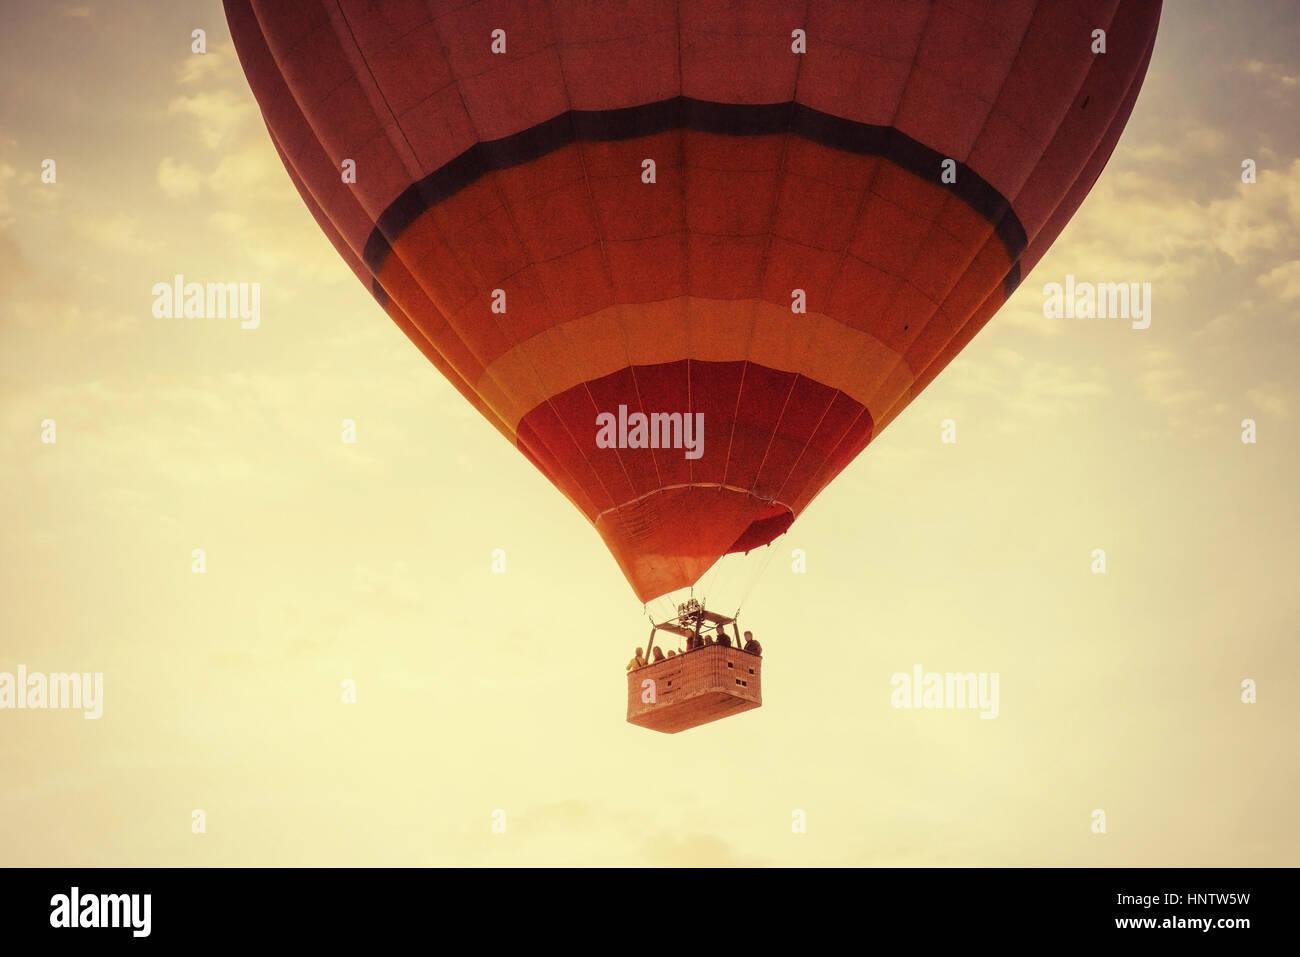 Ballon nebligen Morgen in Kappadokien. Turkei. unscharfe Bilder Stockbild